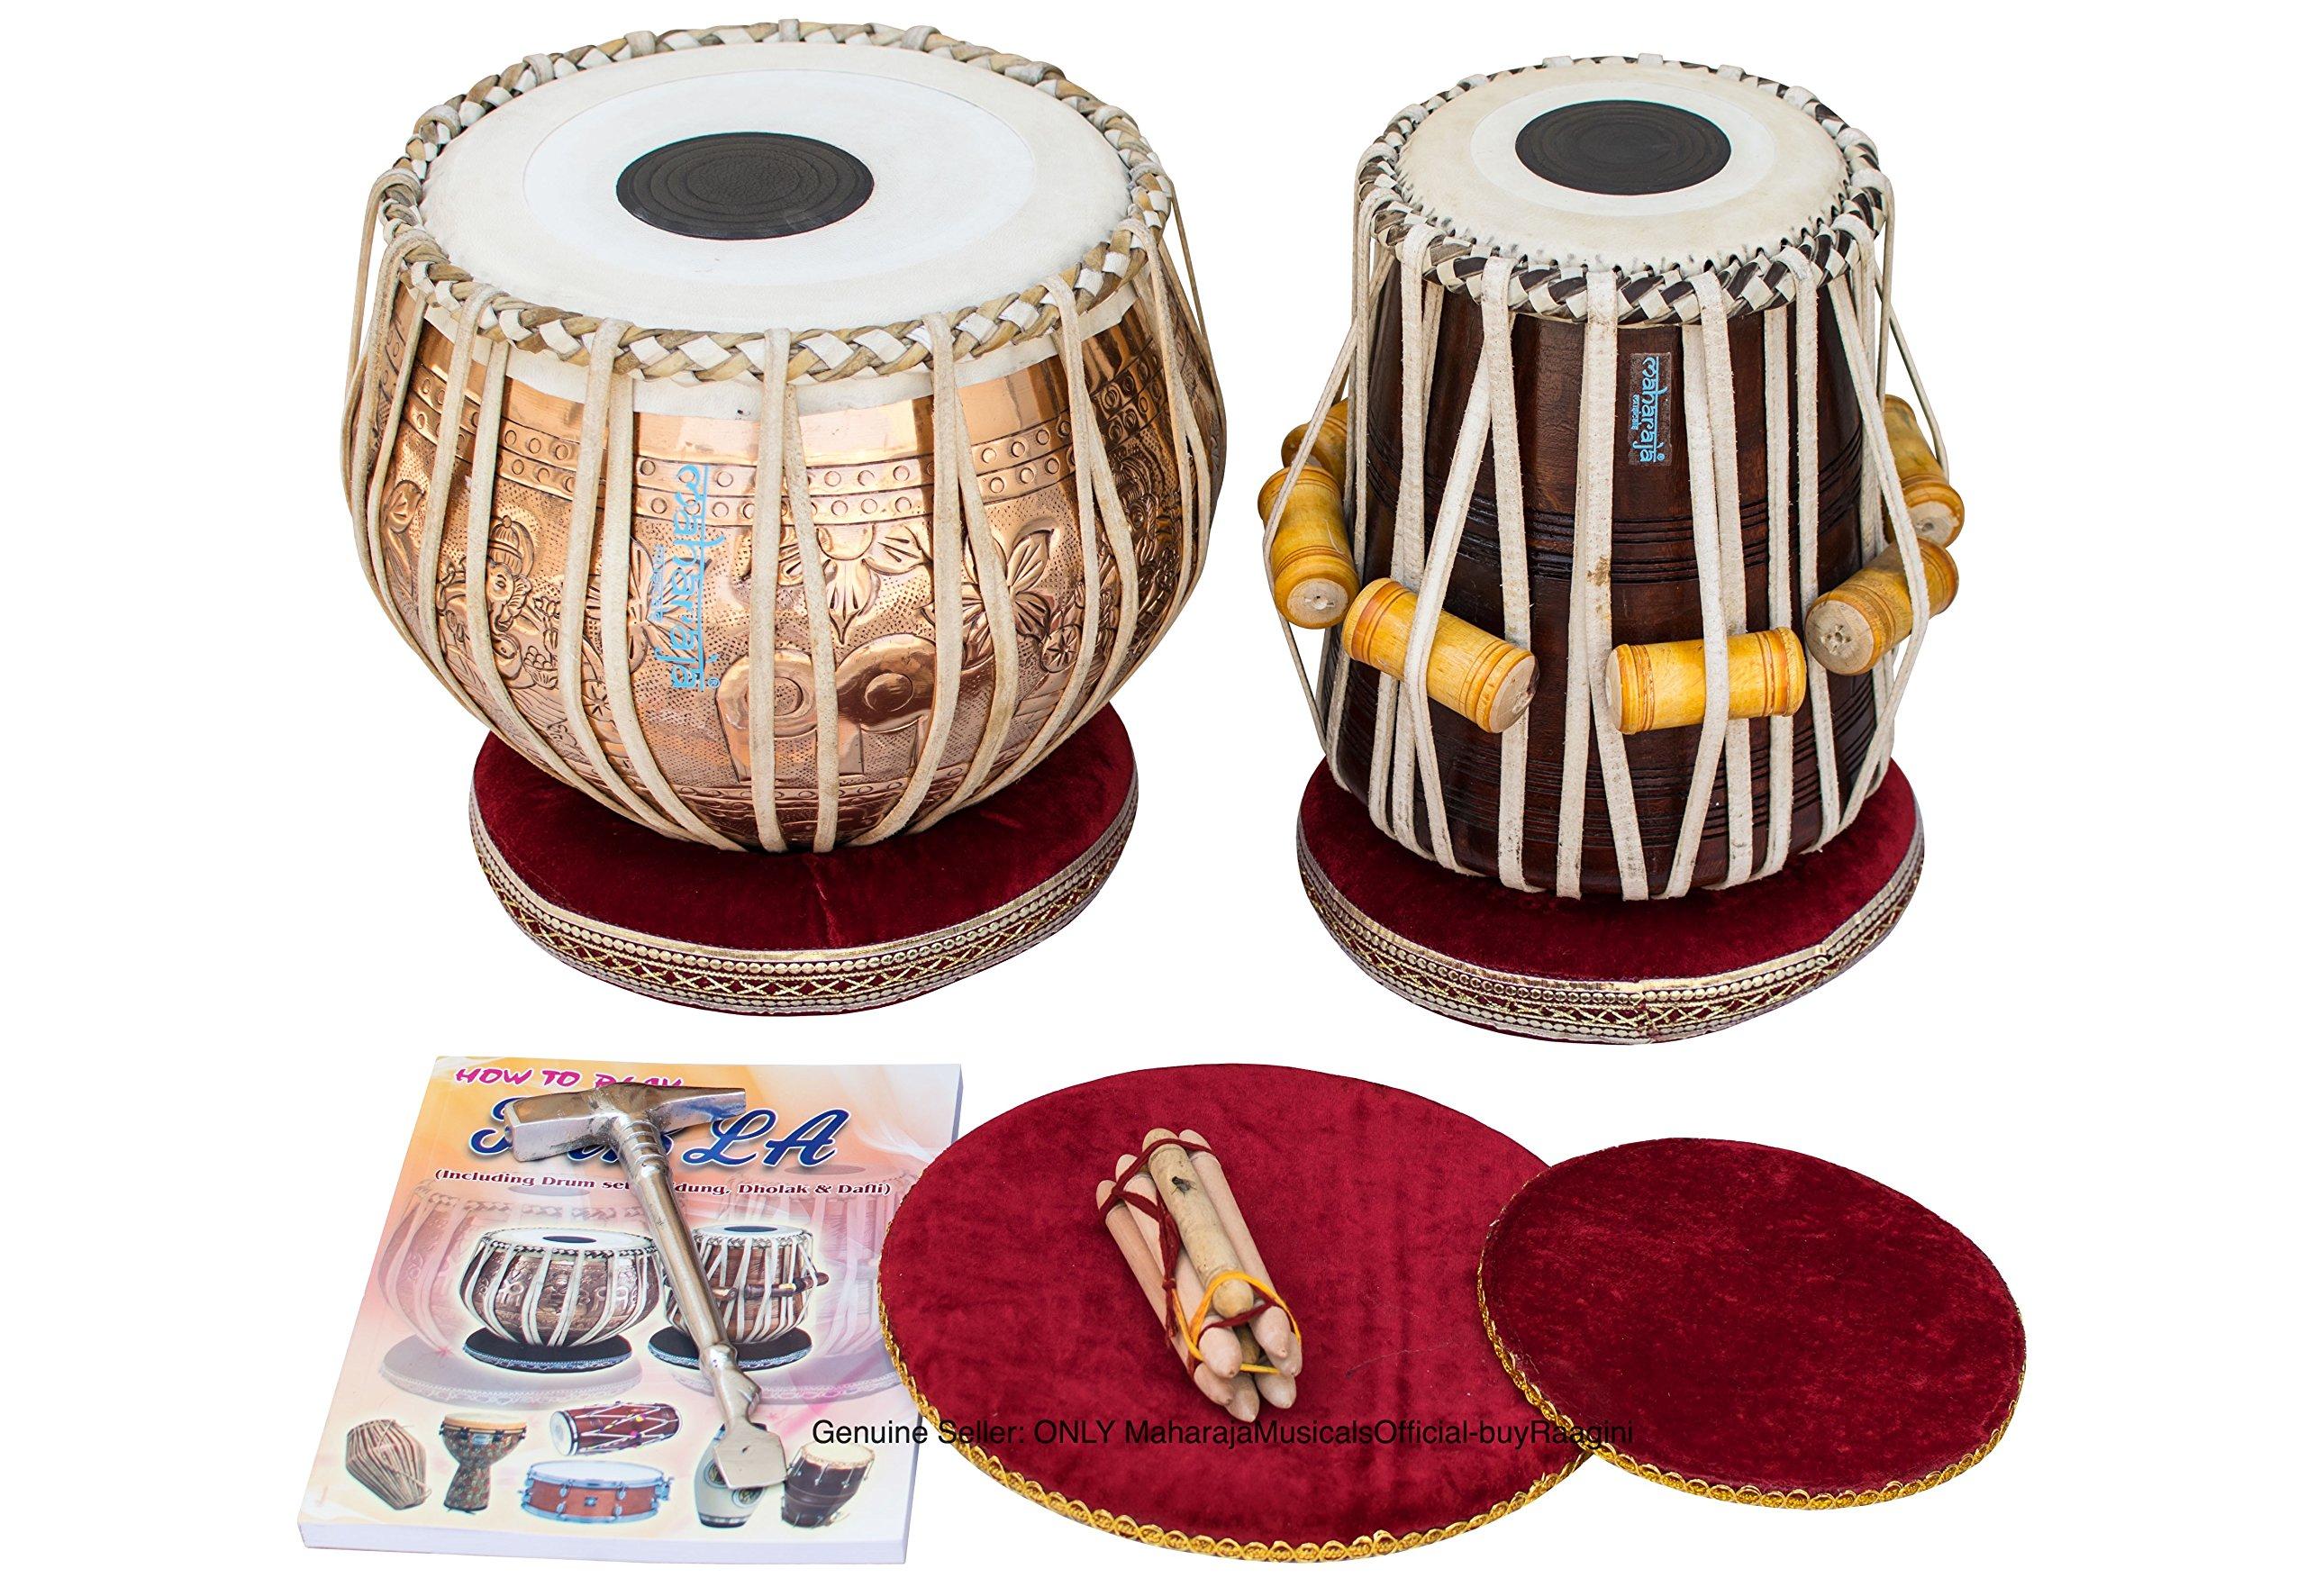 Maharaja Musicals Tabla Set, Professional, 3.5 Kg Copper Bayan - Flower Design, Sheesham Dayan - C Sharp, Padded Bag, Hammer, Cushions, Cover, Tabla Hand Drums Indian (PDI-BHJ)